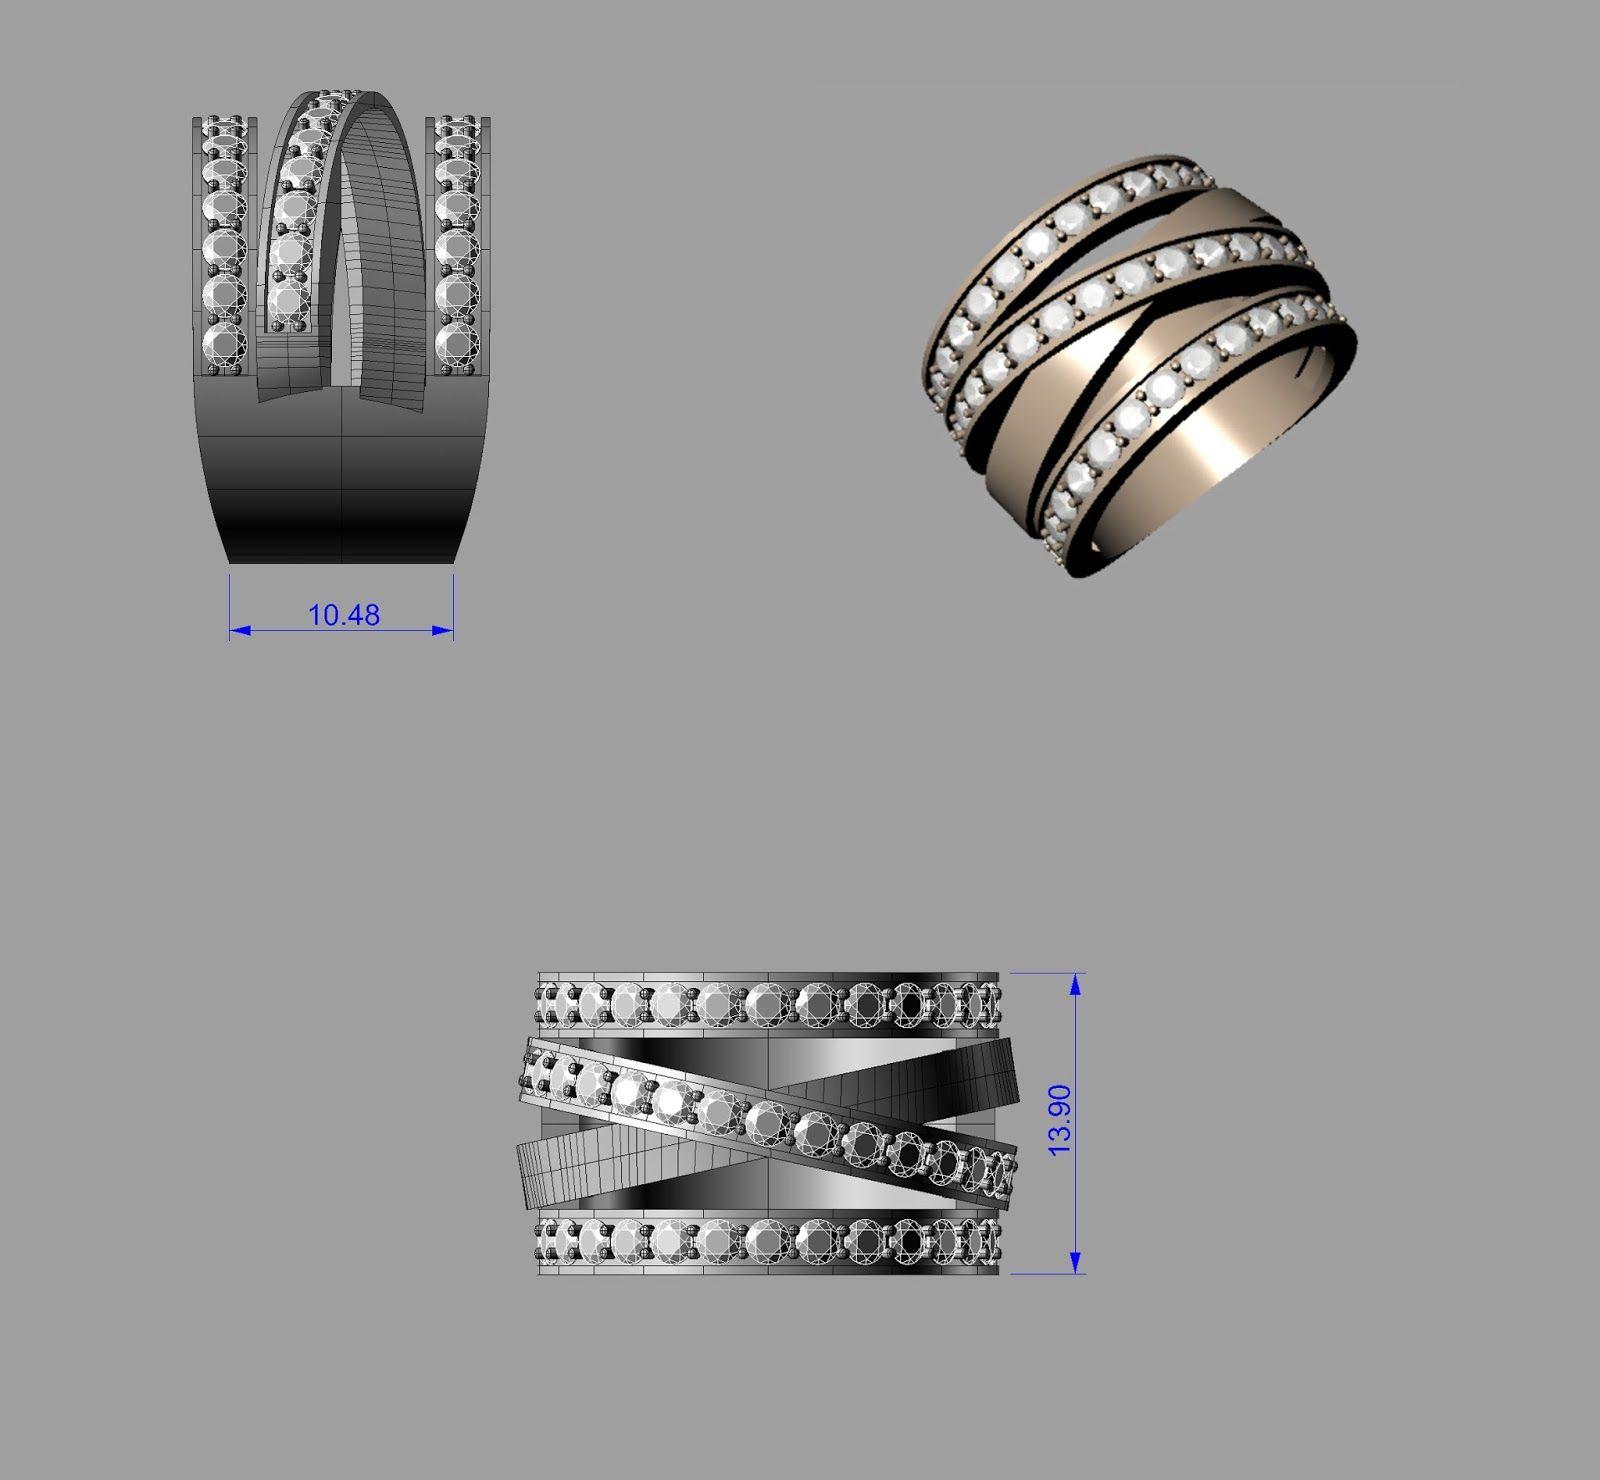 Cad Design Cad Jewelry design Custom Made Jewelry Queens Jeweler